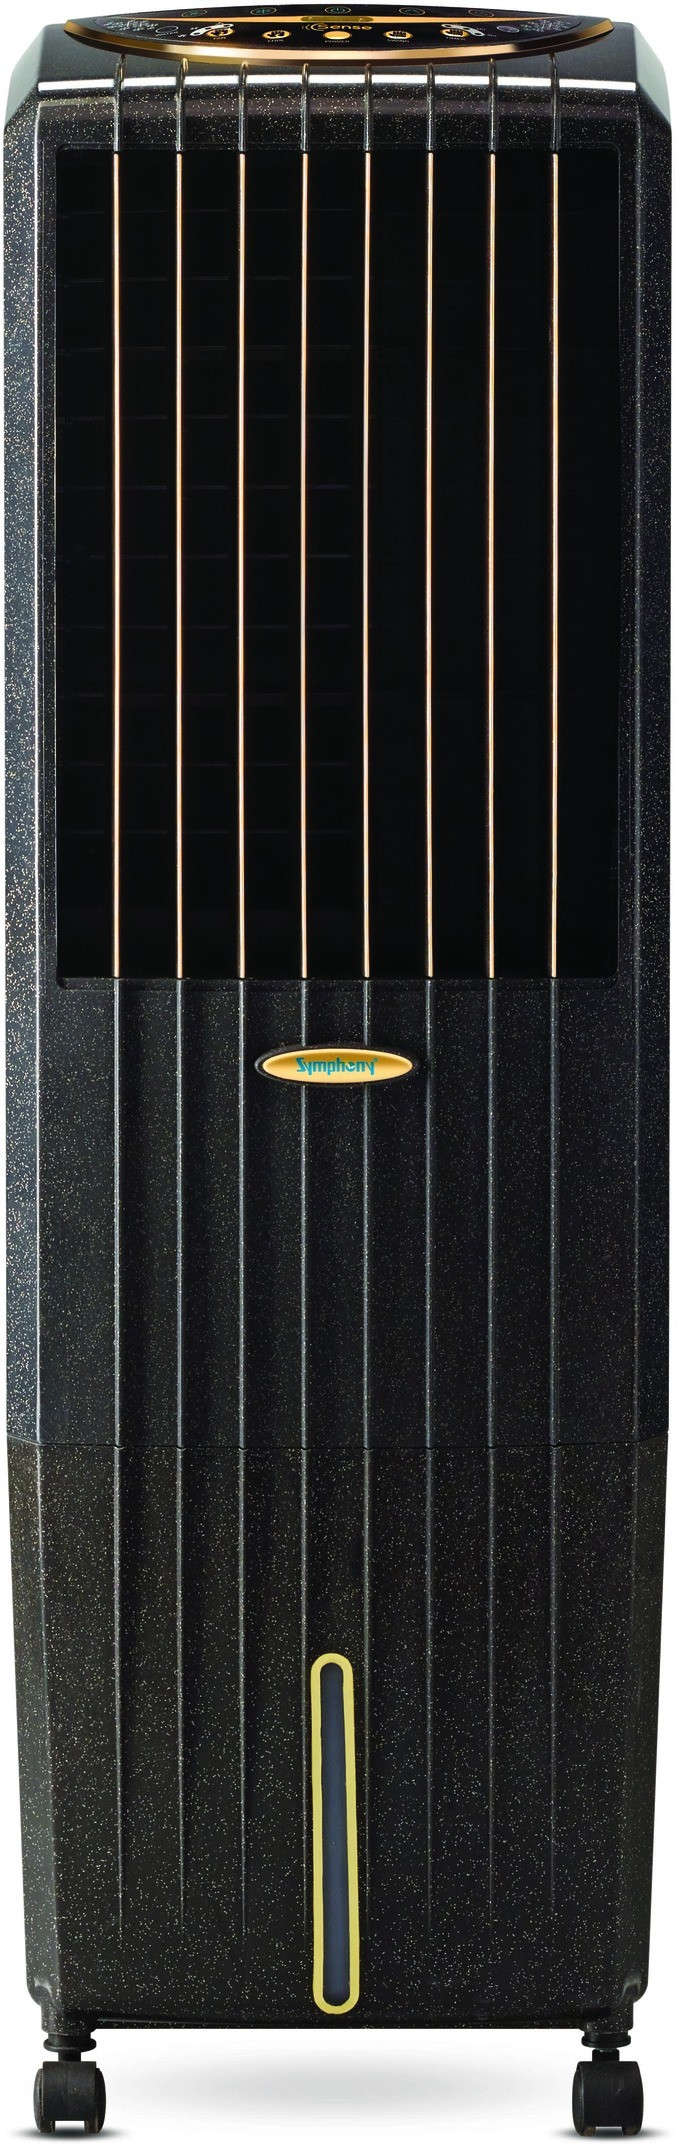 Symphony Sense 22 Room Air Cooler Image